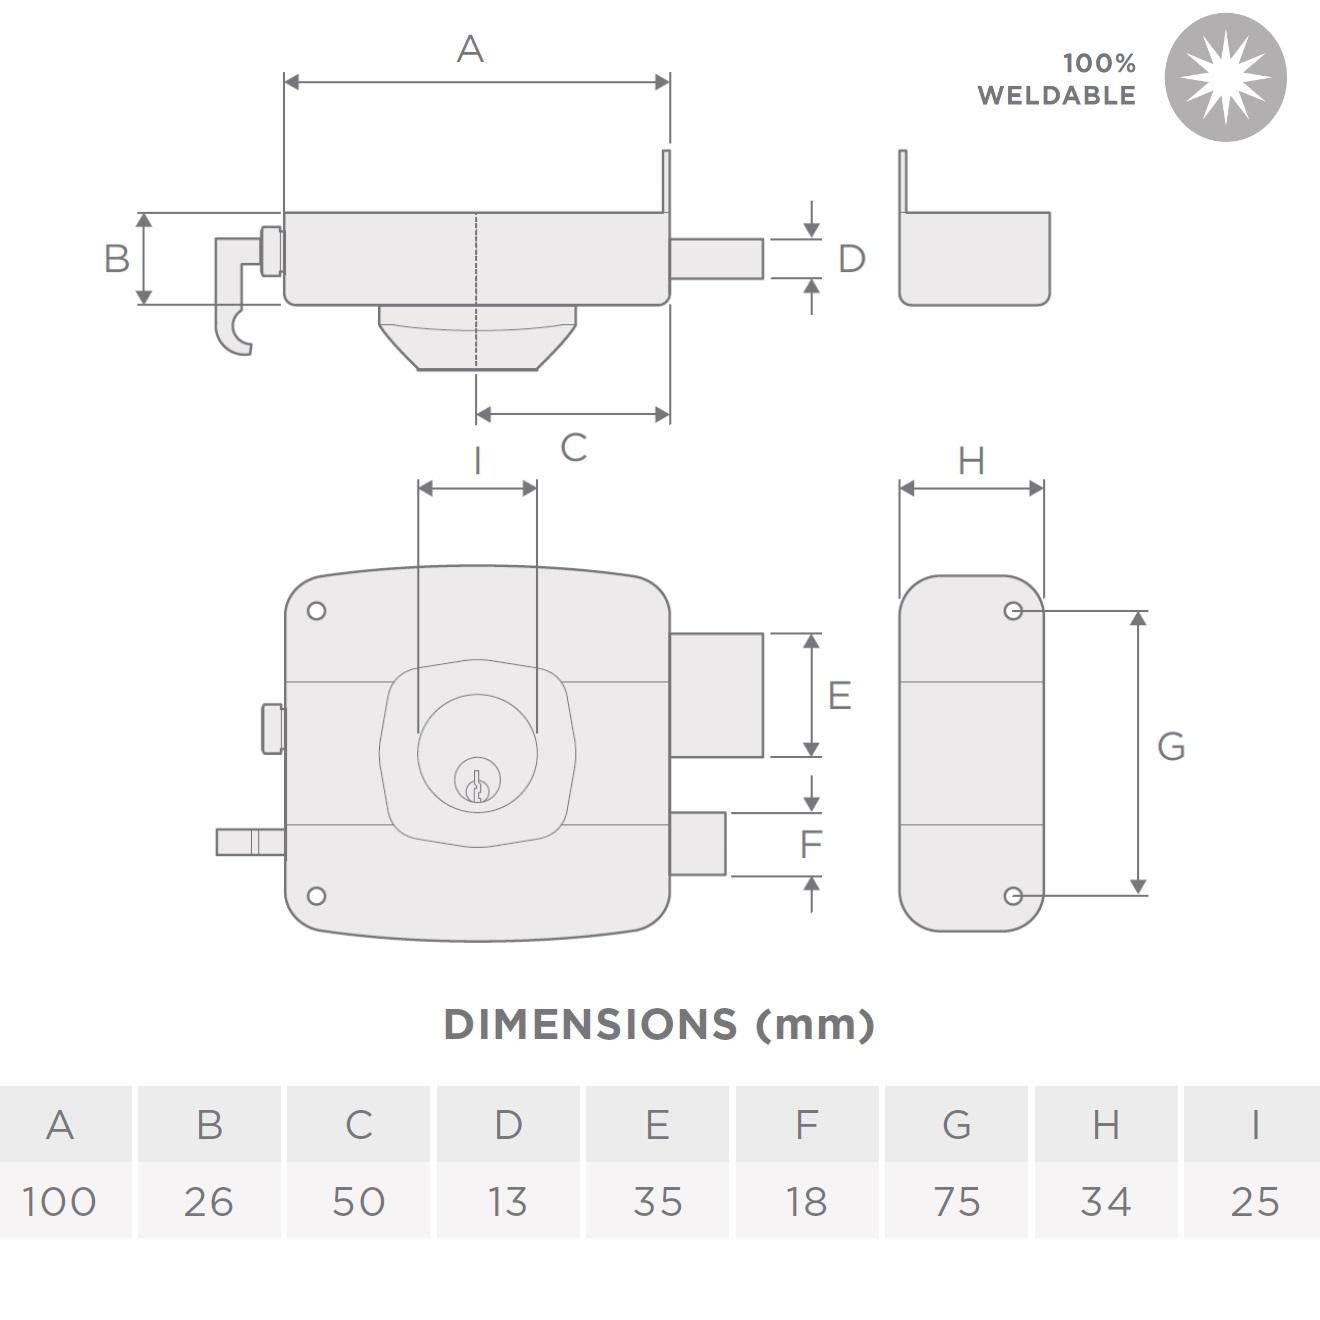 single-bolt-50mm-dimension-7pin-geo